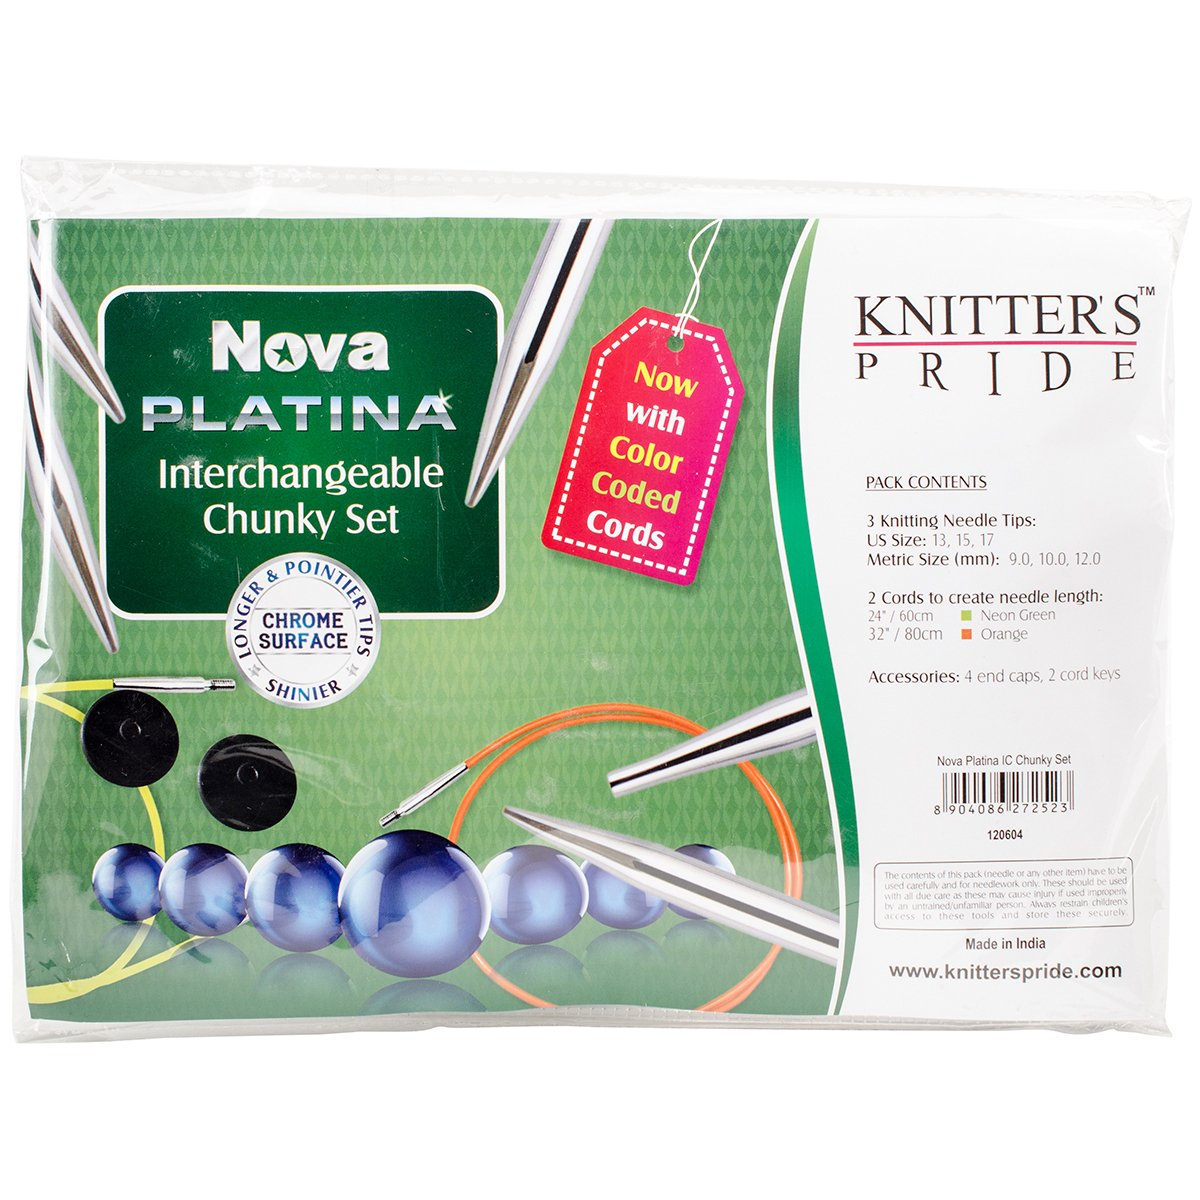 Knitter's Pride Nova Platina Chunky Interchangeable Needles Set